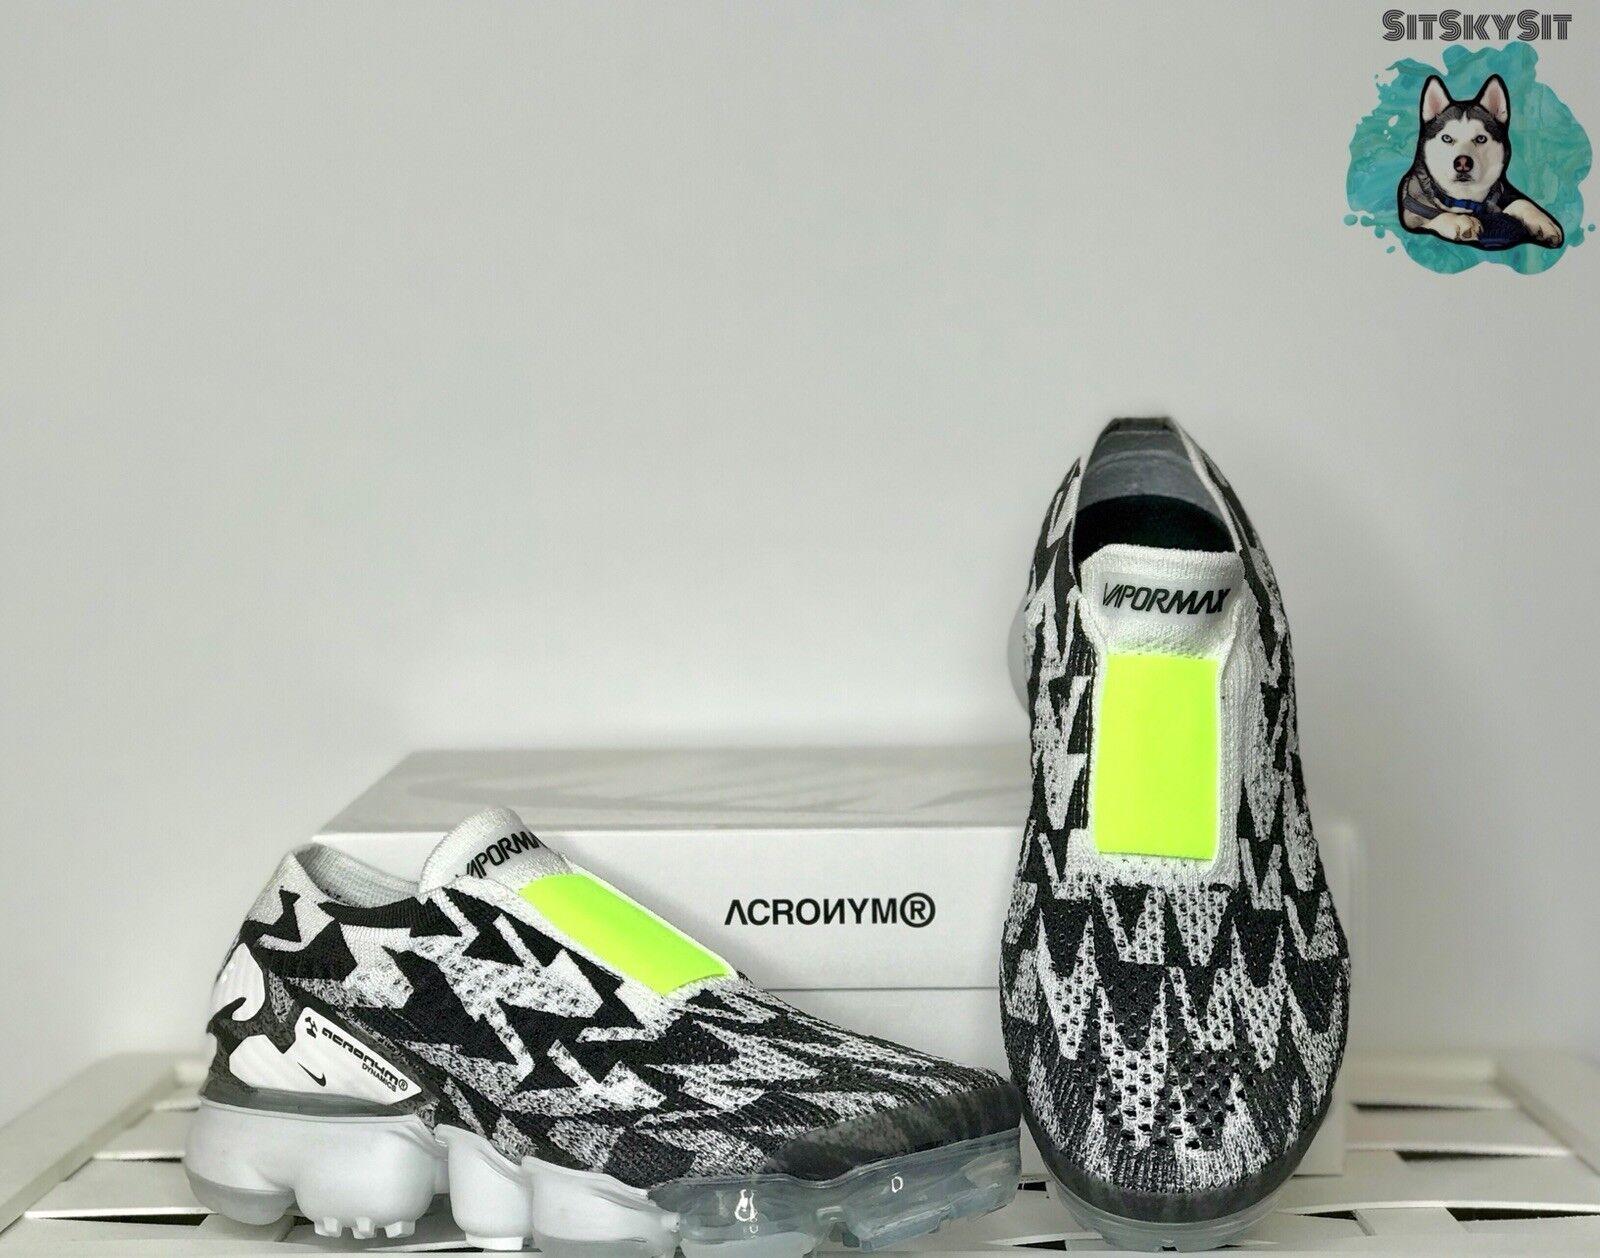 sneakers for cheap b4b53 cf5b7 Nike air vapormax labor akronym akronym akronym flyknit moc 2 weiße schwarze  neon aq0996-001 aa114c